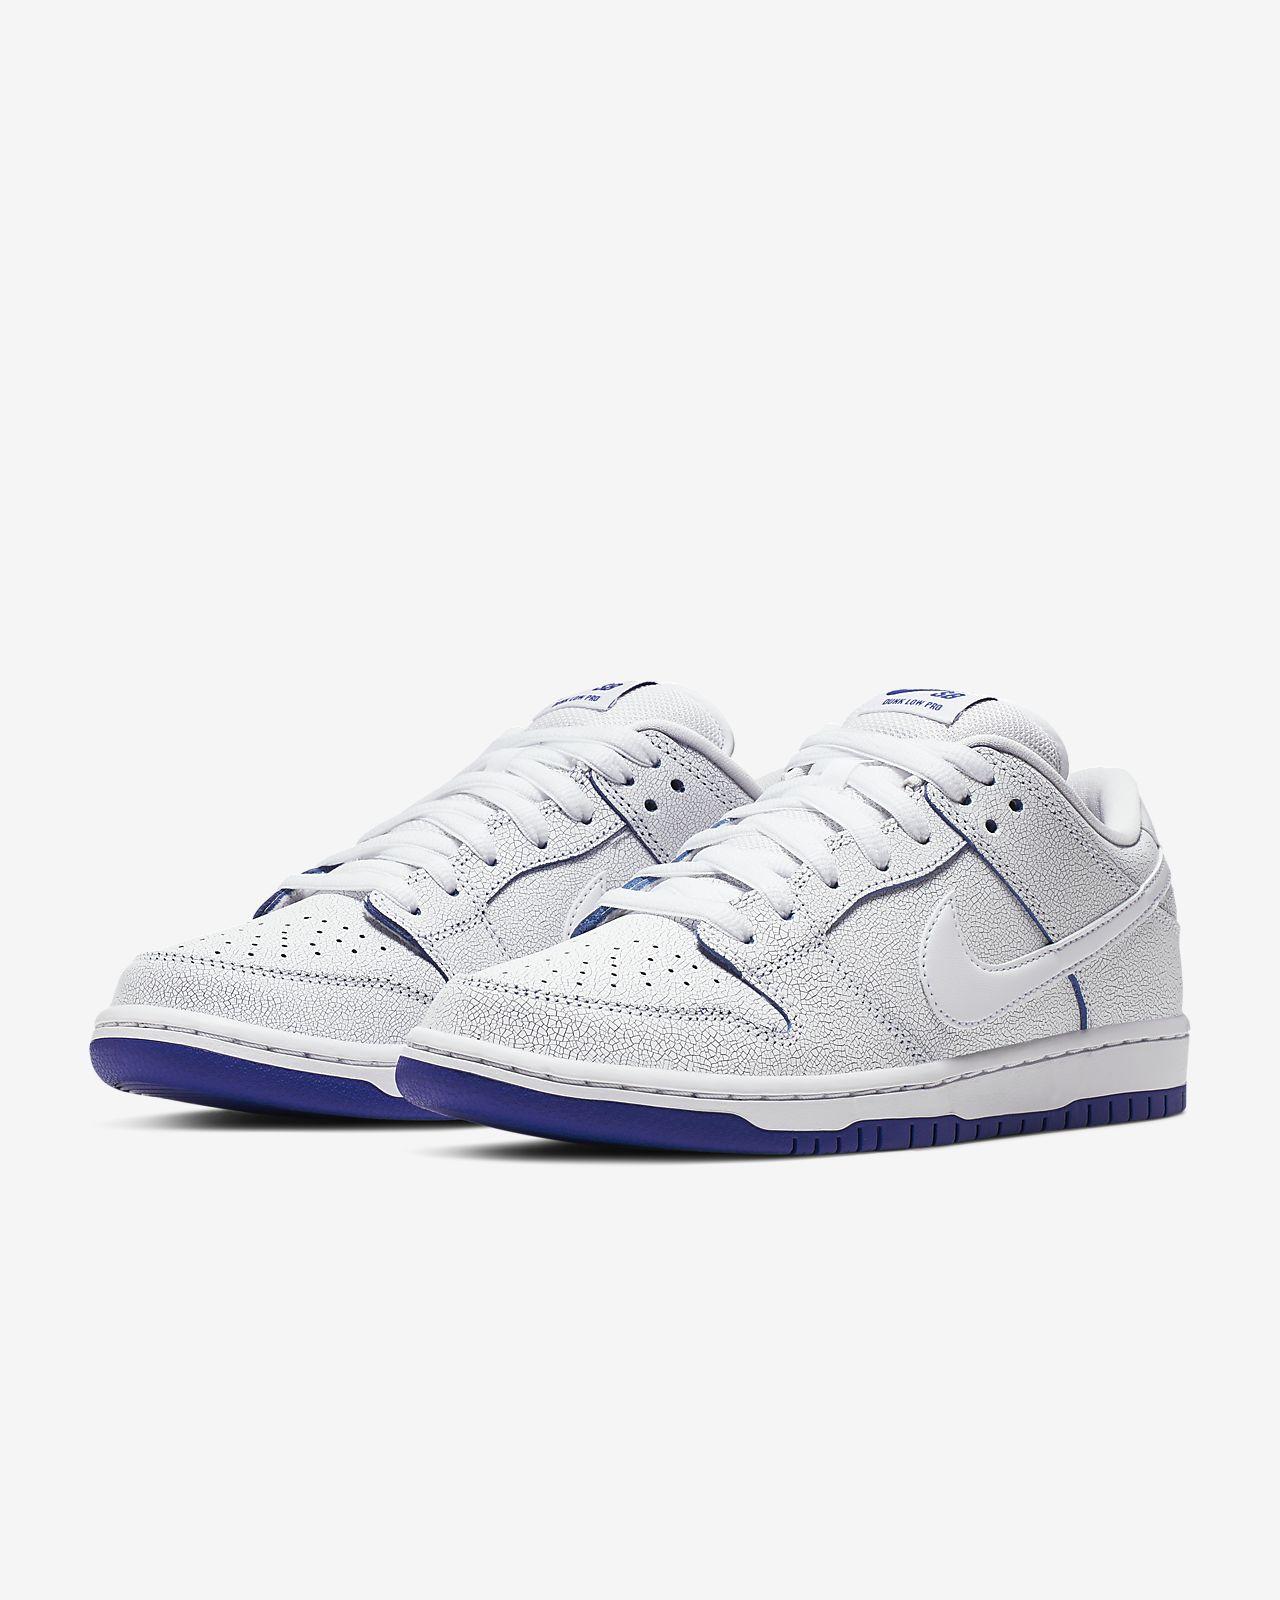 buy online df03c b102f Nike SB Dunk Low Pro Premium Skate Shoe